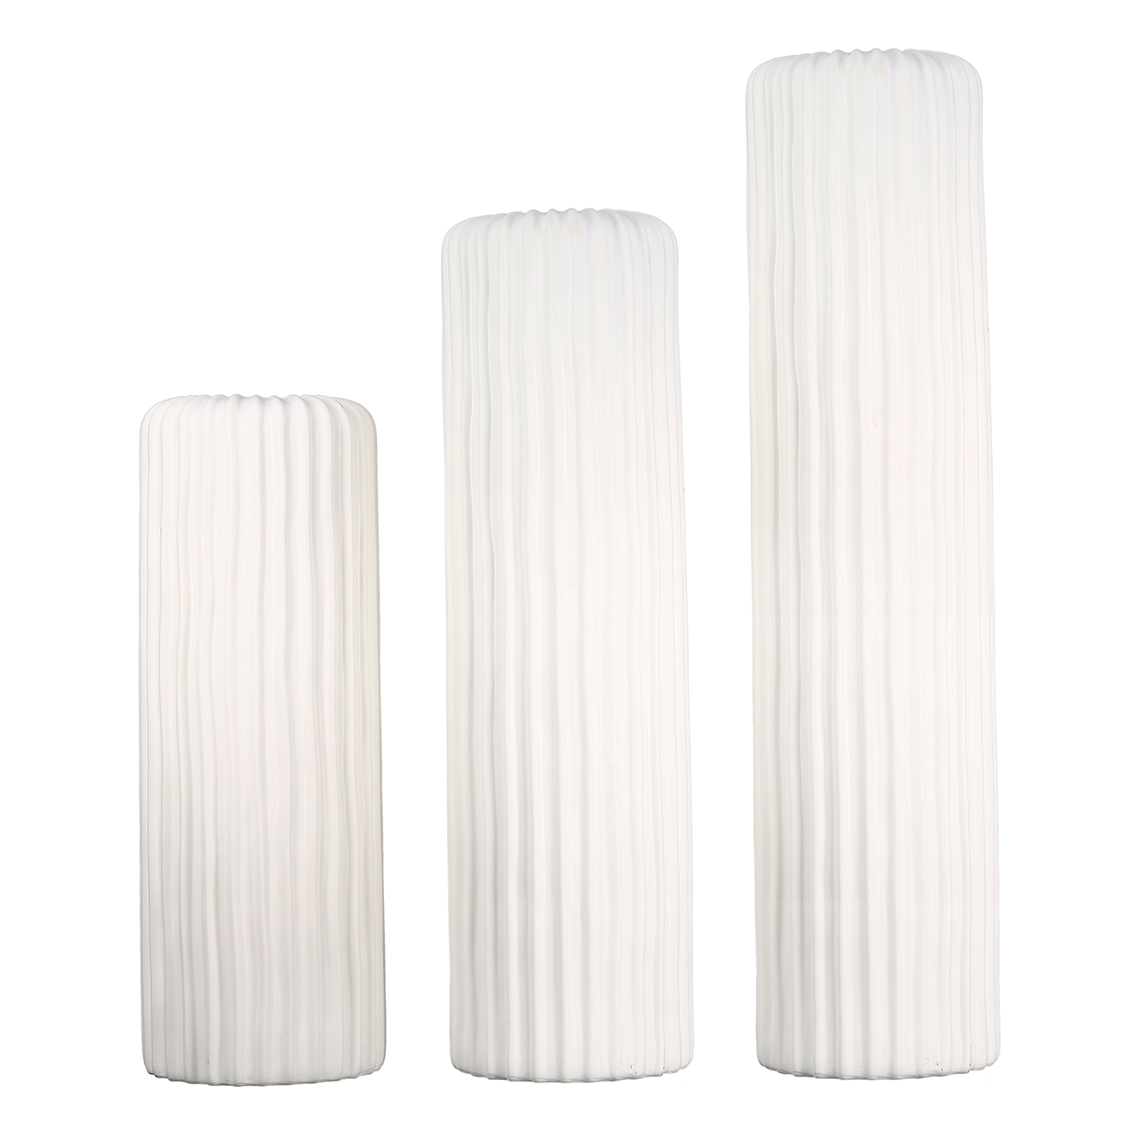 Porcelánová váza Elias, 58 cm, bílá